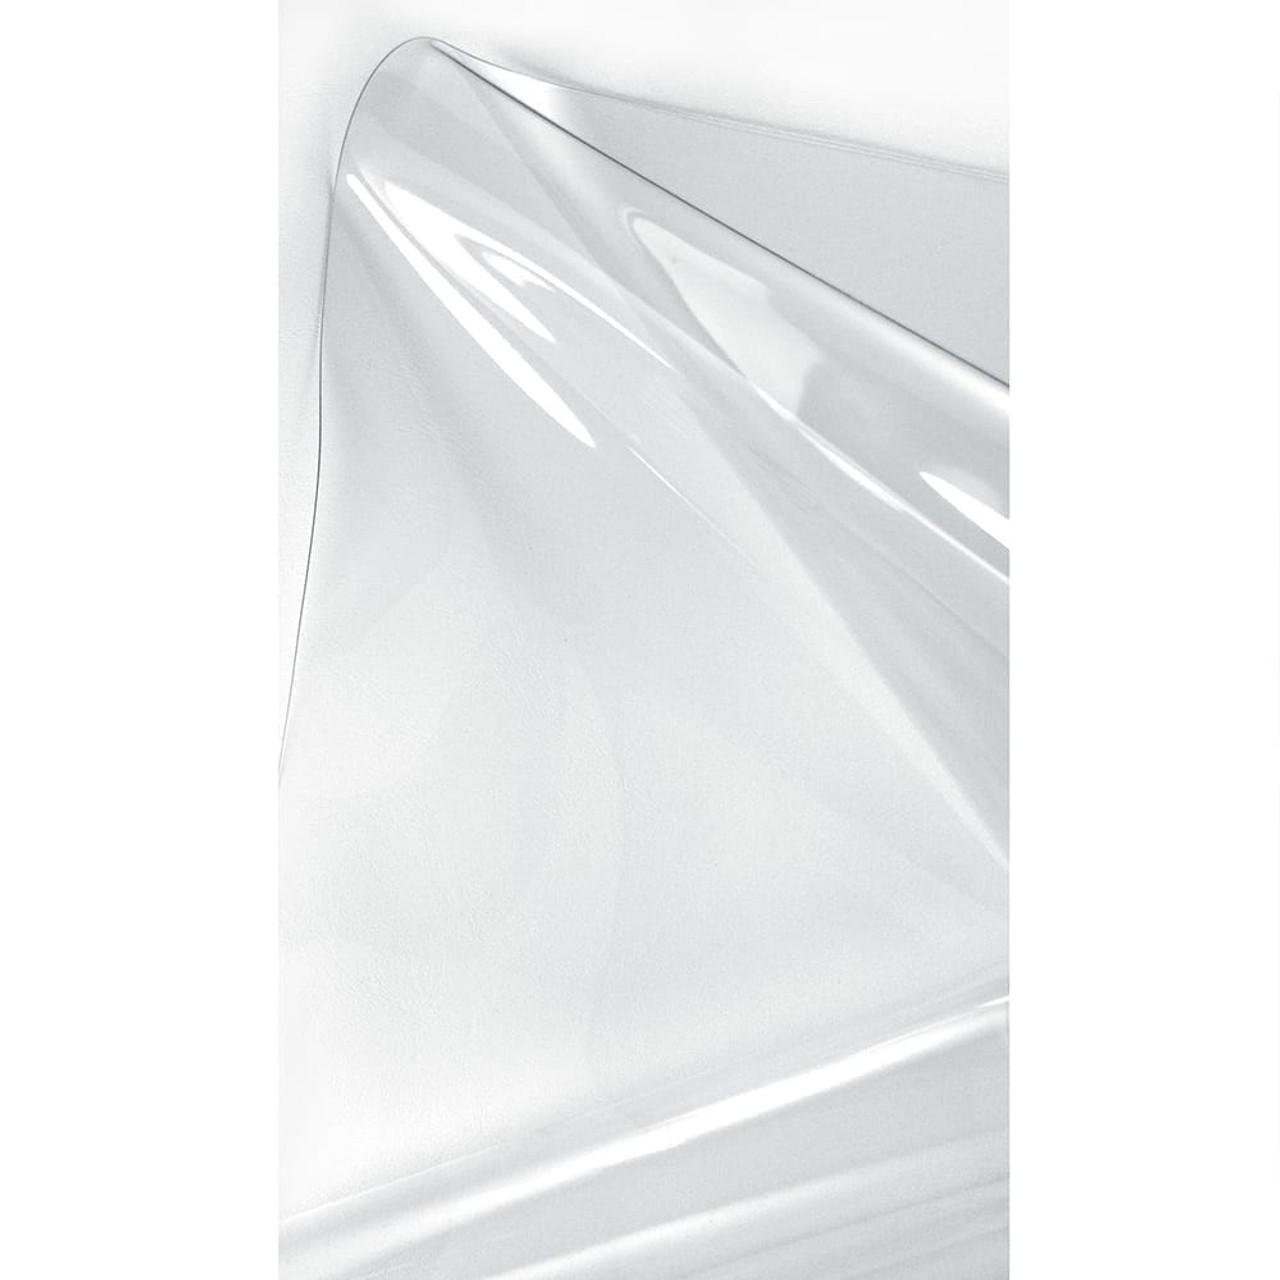 Winterview Plastic Film for Screen Porches